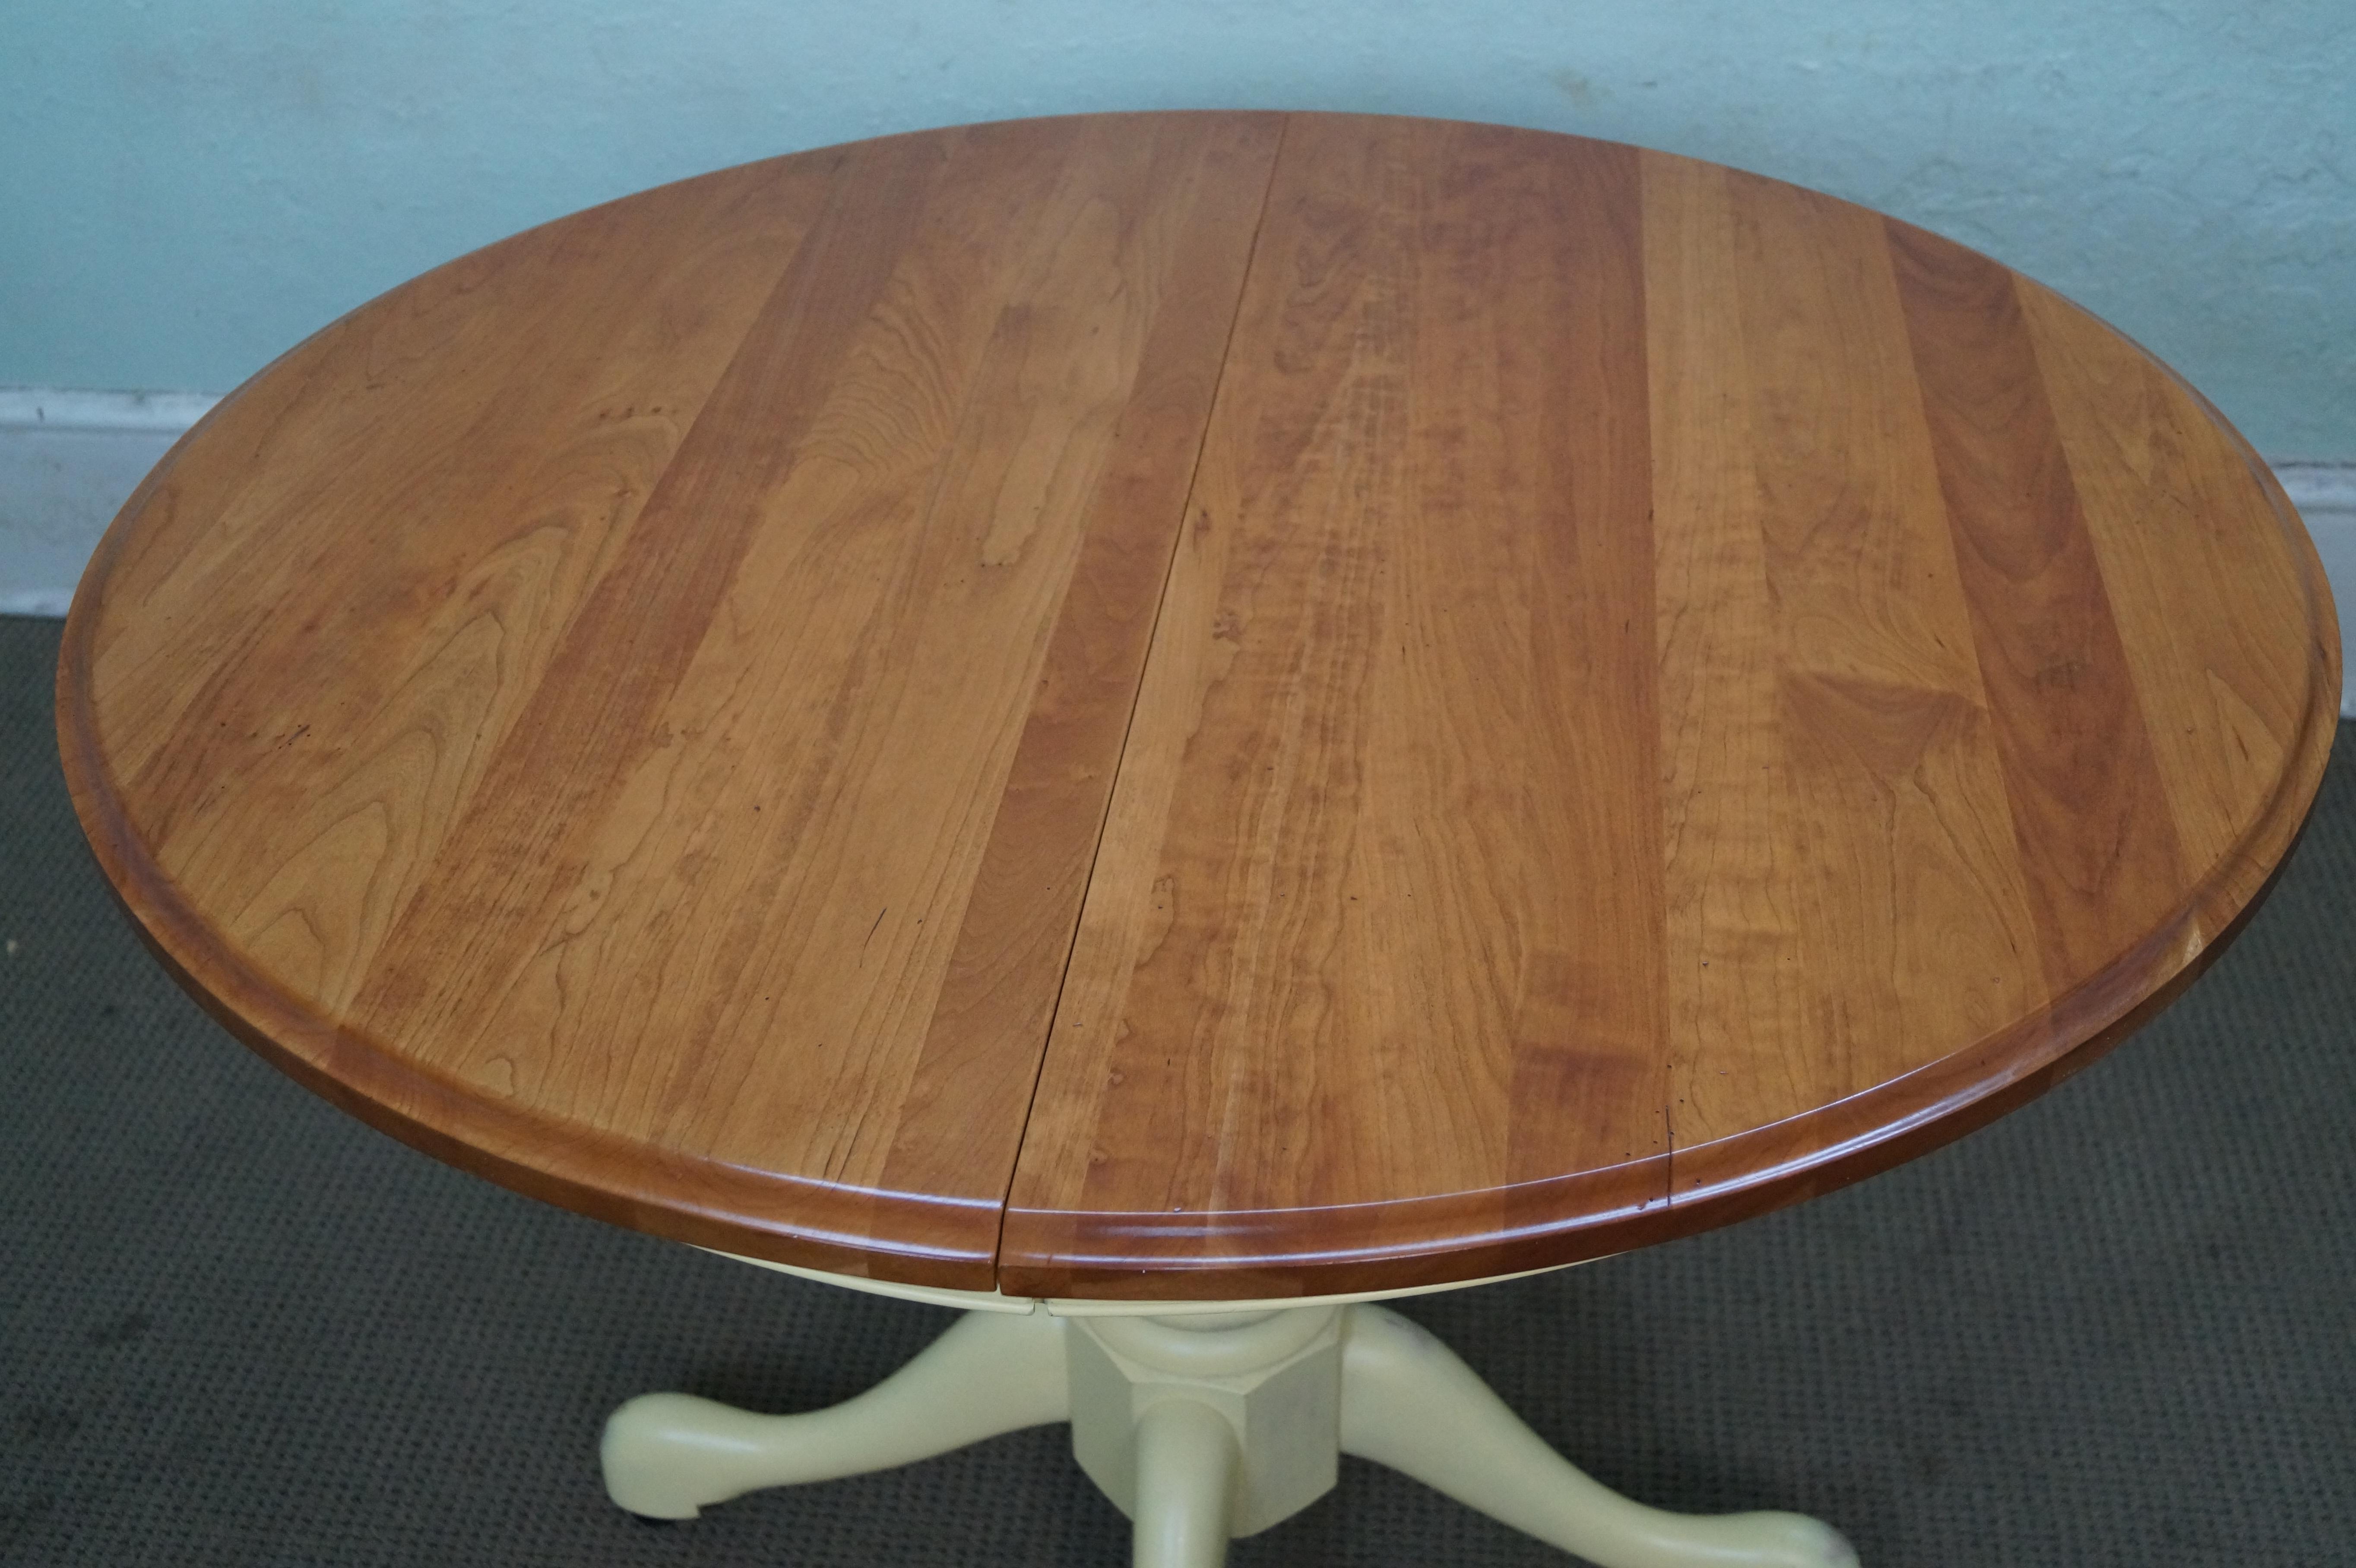 Zimmerman Chair American Heirloom Dining Table   4   Image 3 Of 10